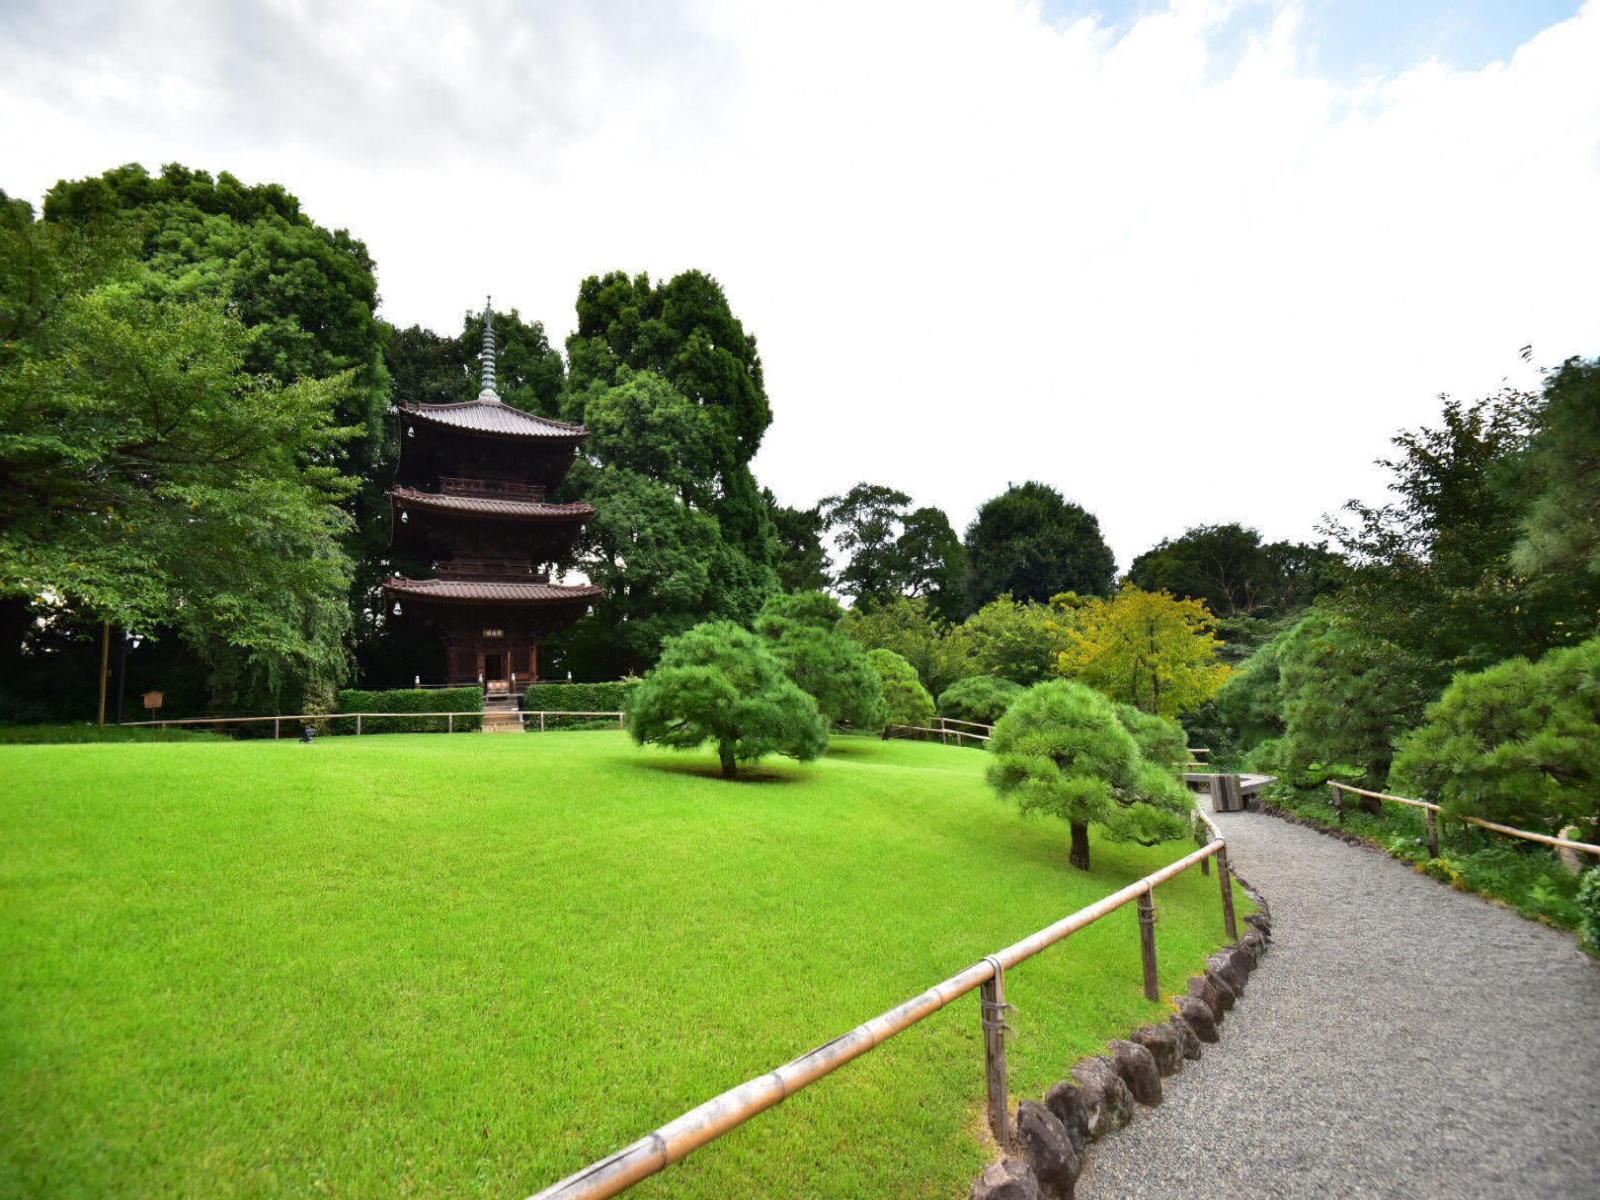 Kyoto Hotel Okura | Luxury Hotel in Kyoto